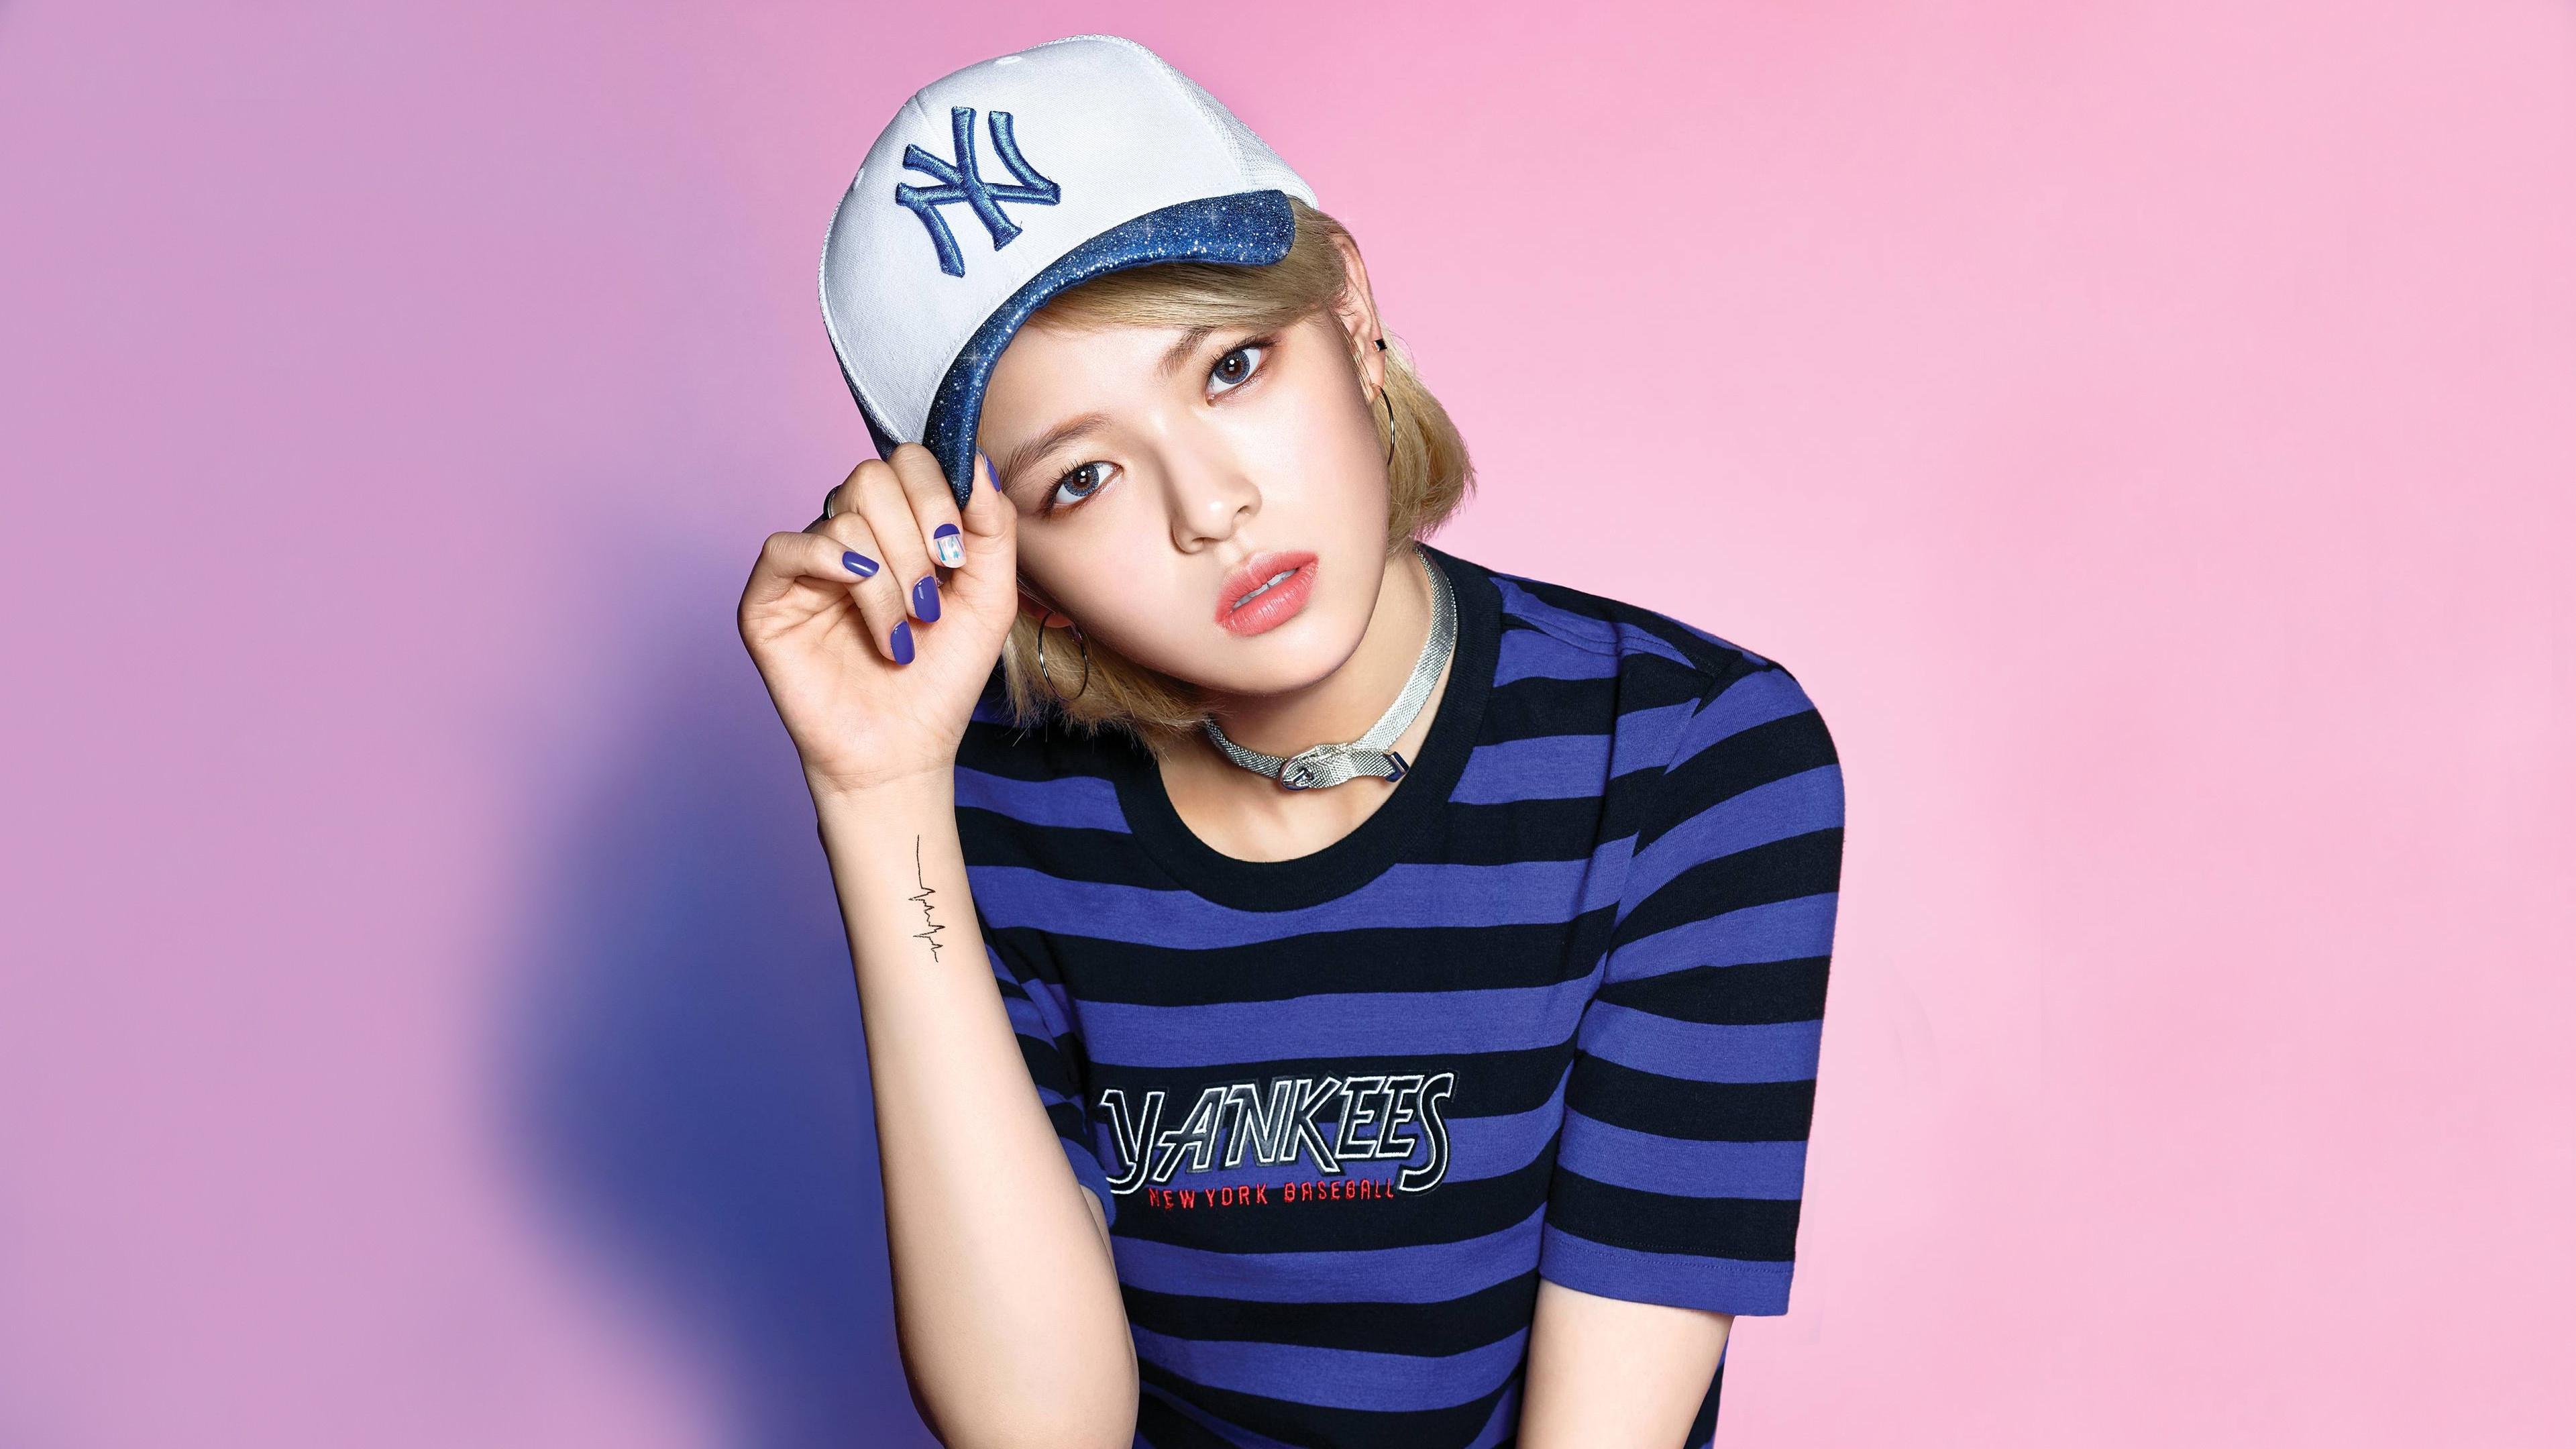 Twice Twice JeongYeon Girl Band K Pop Asian Korean Korean Women Pink Lipstick Pink Background 3840x2160